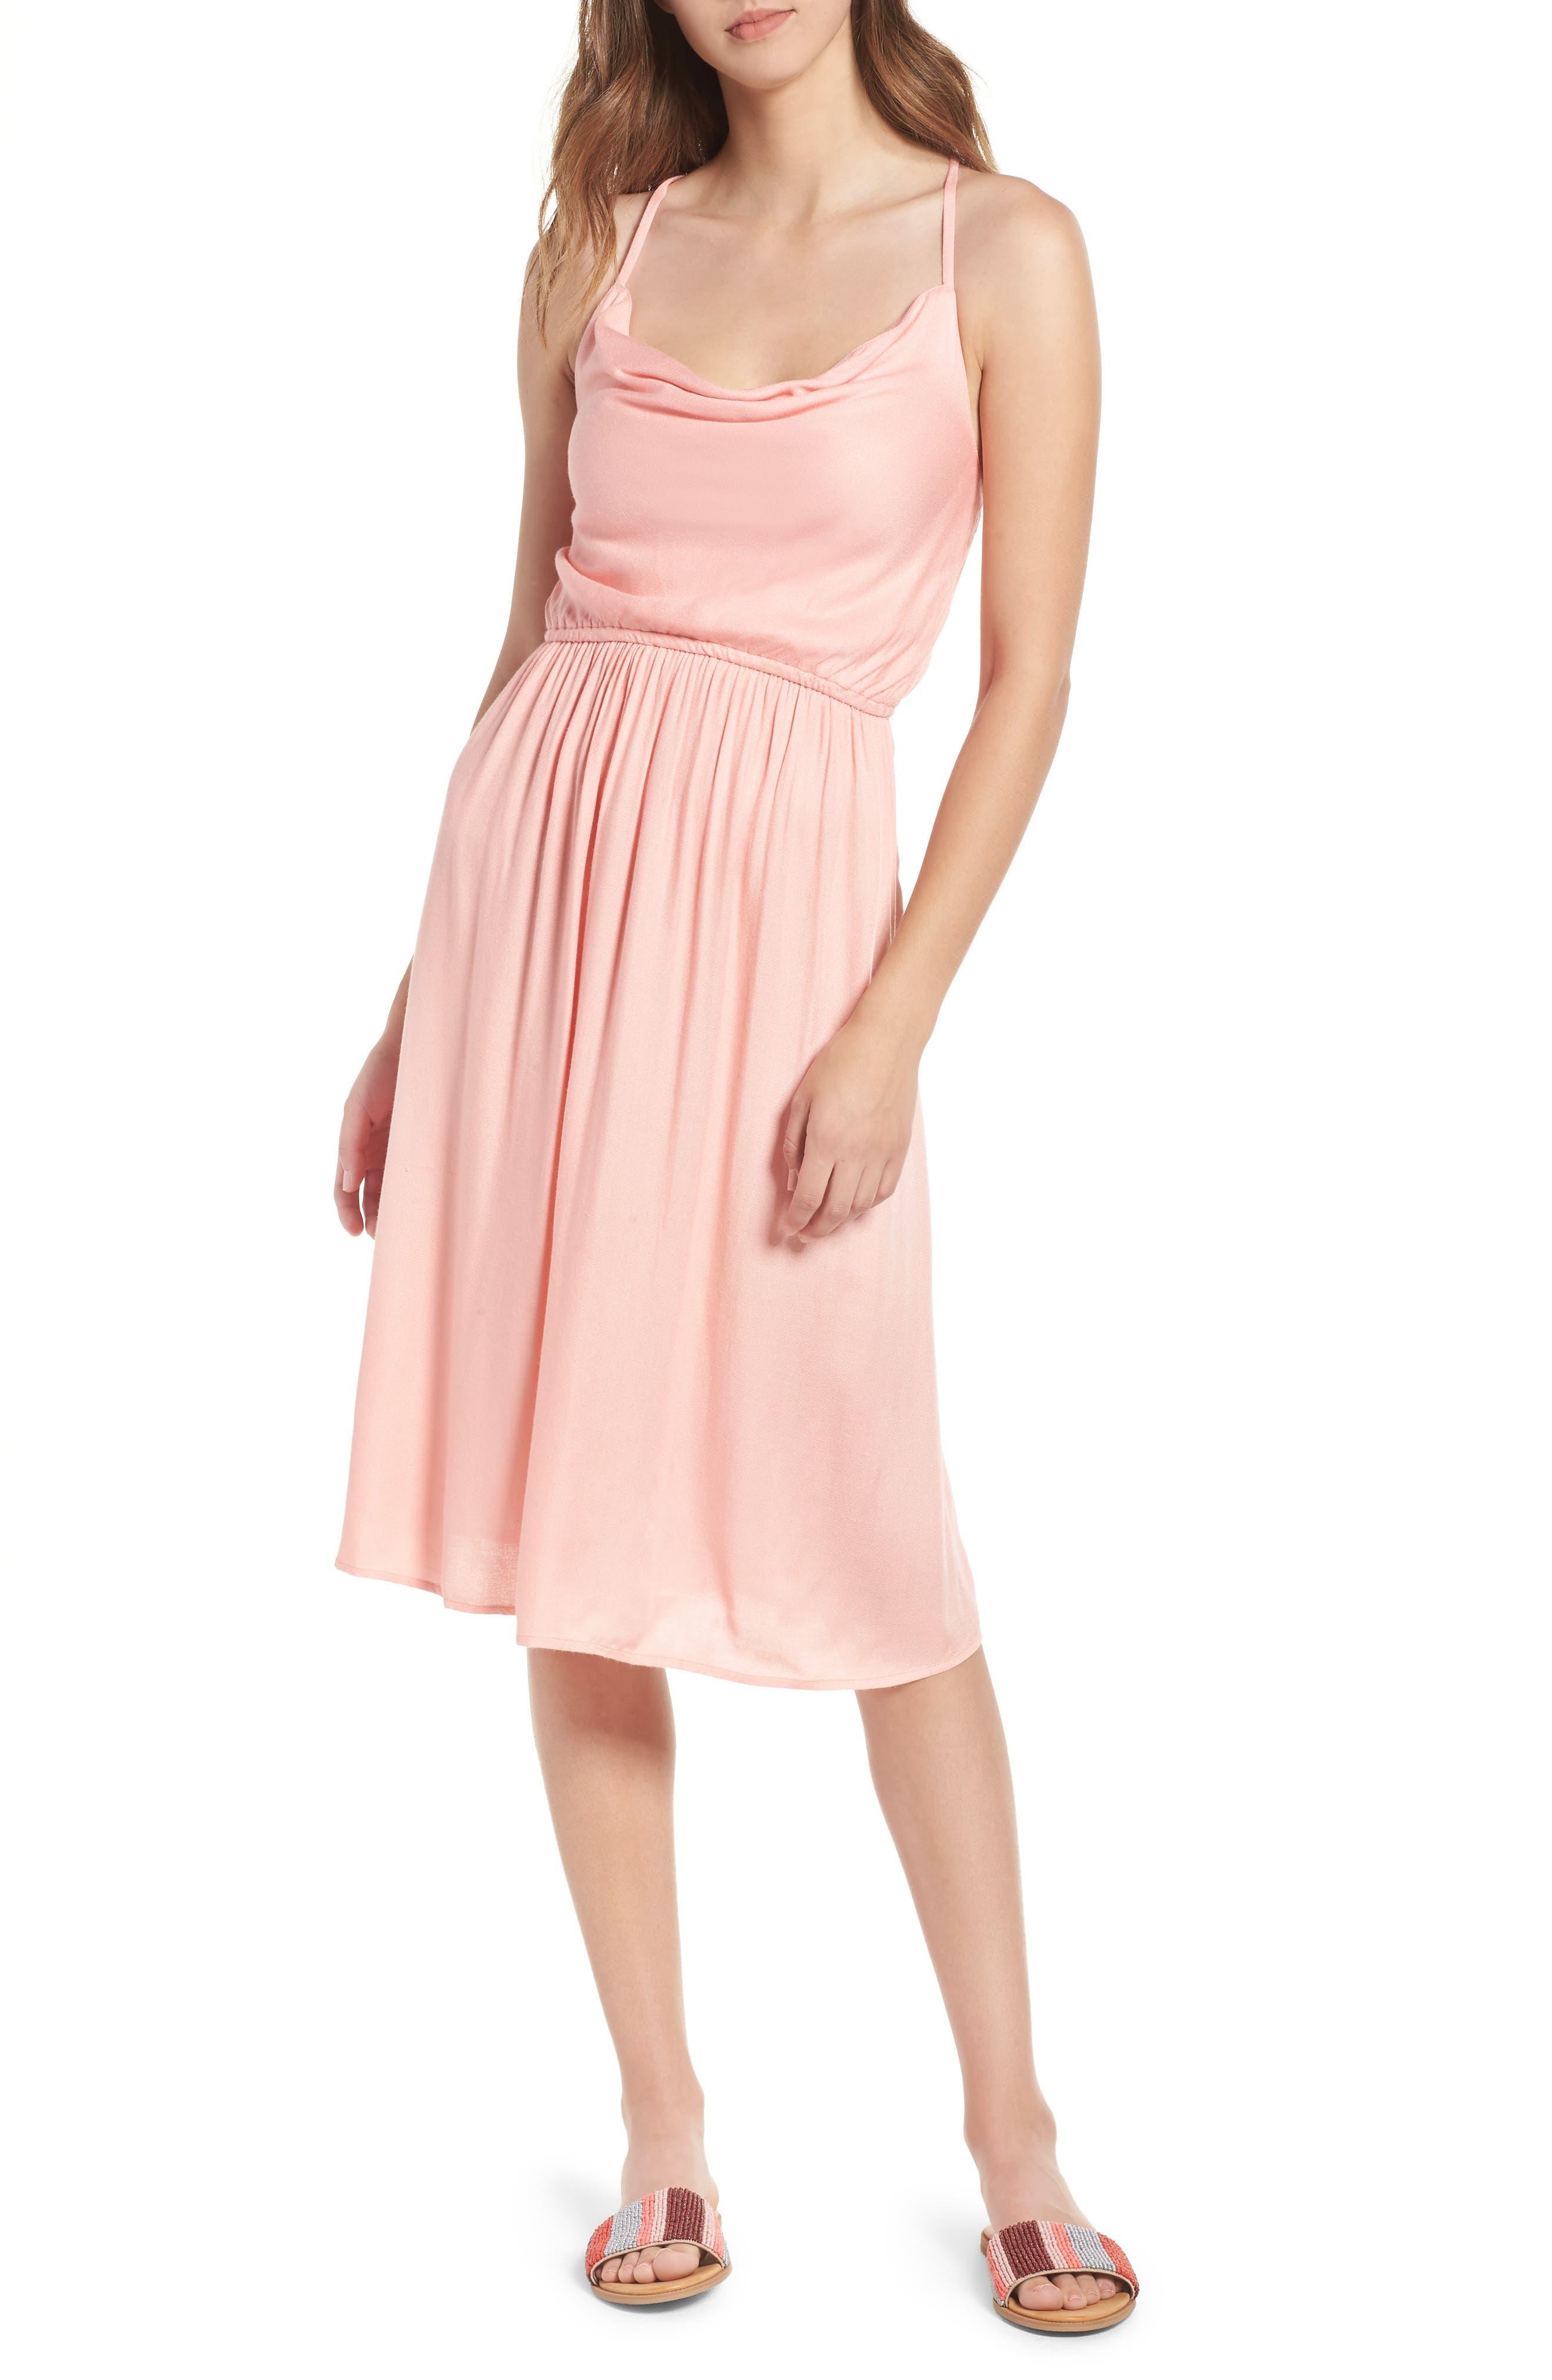 Mystic Mama Dress,                             Main thumbnail 1, color,                             950